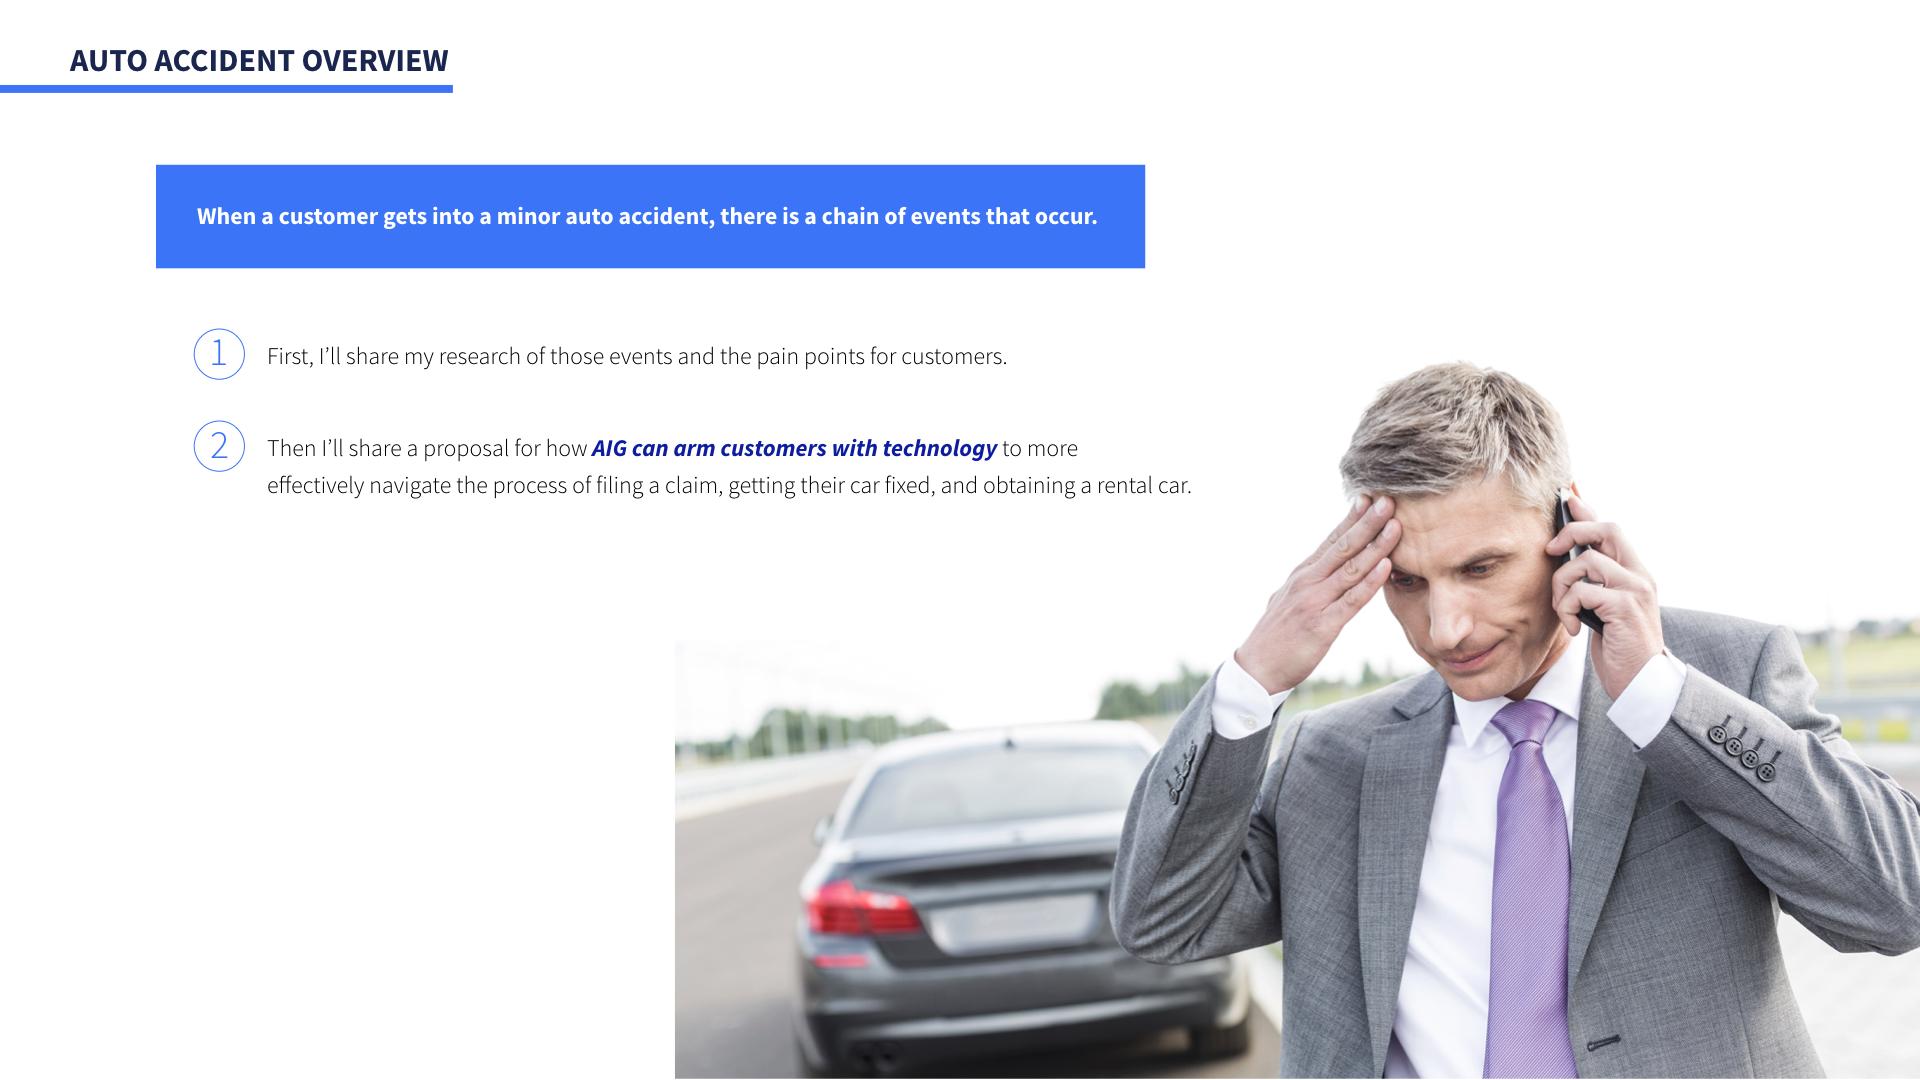 Auto Accident Overview